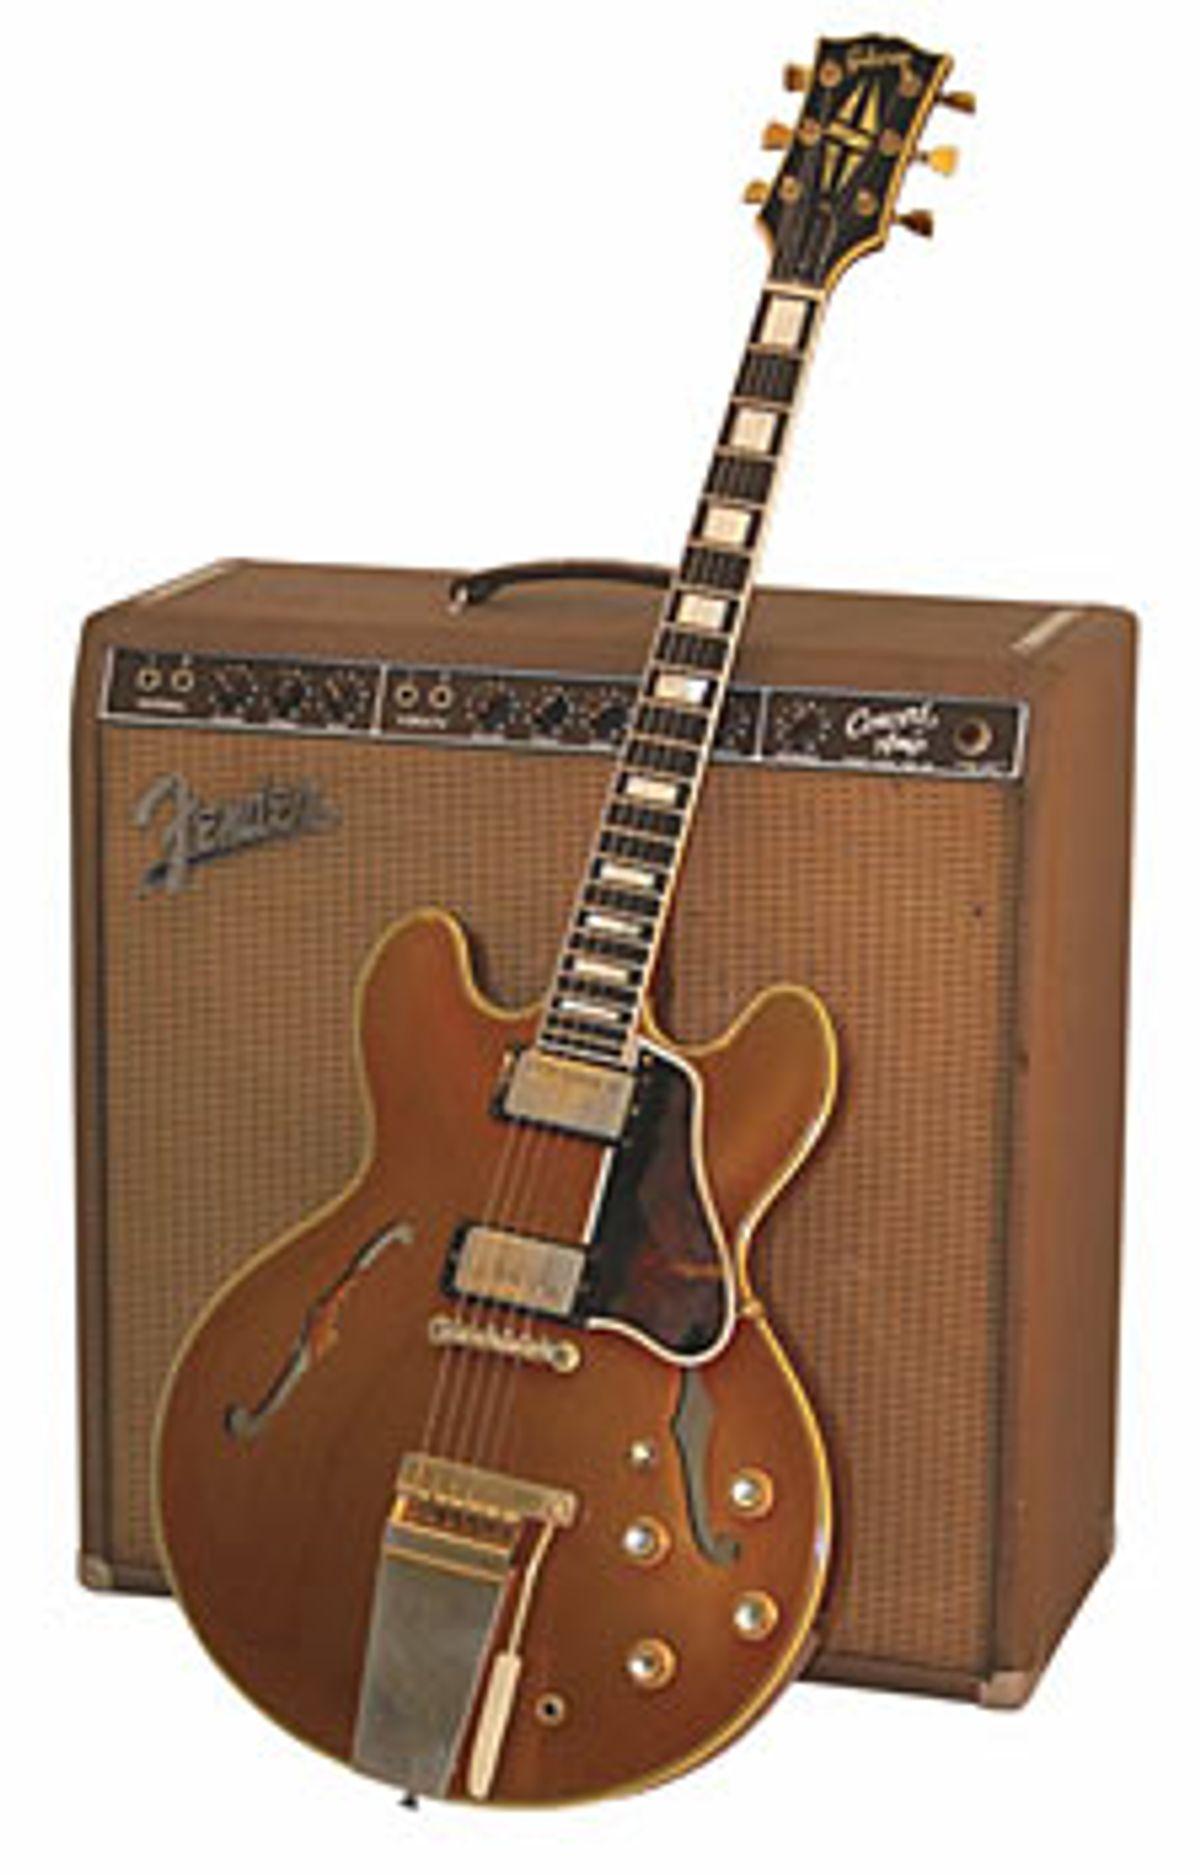 1965 Gibson ES-355 Mono Sparkling Burgundy